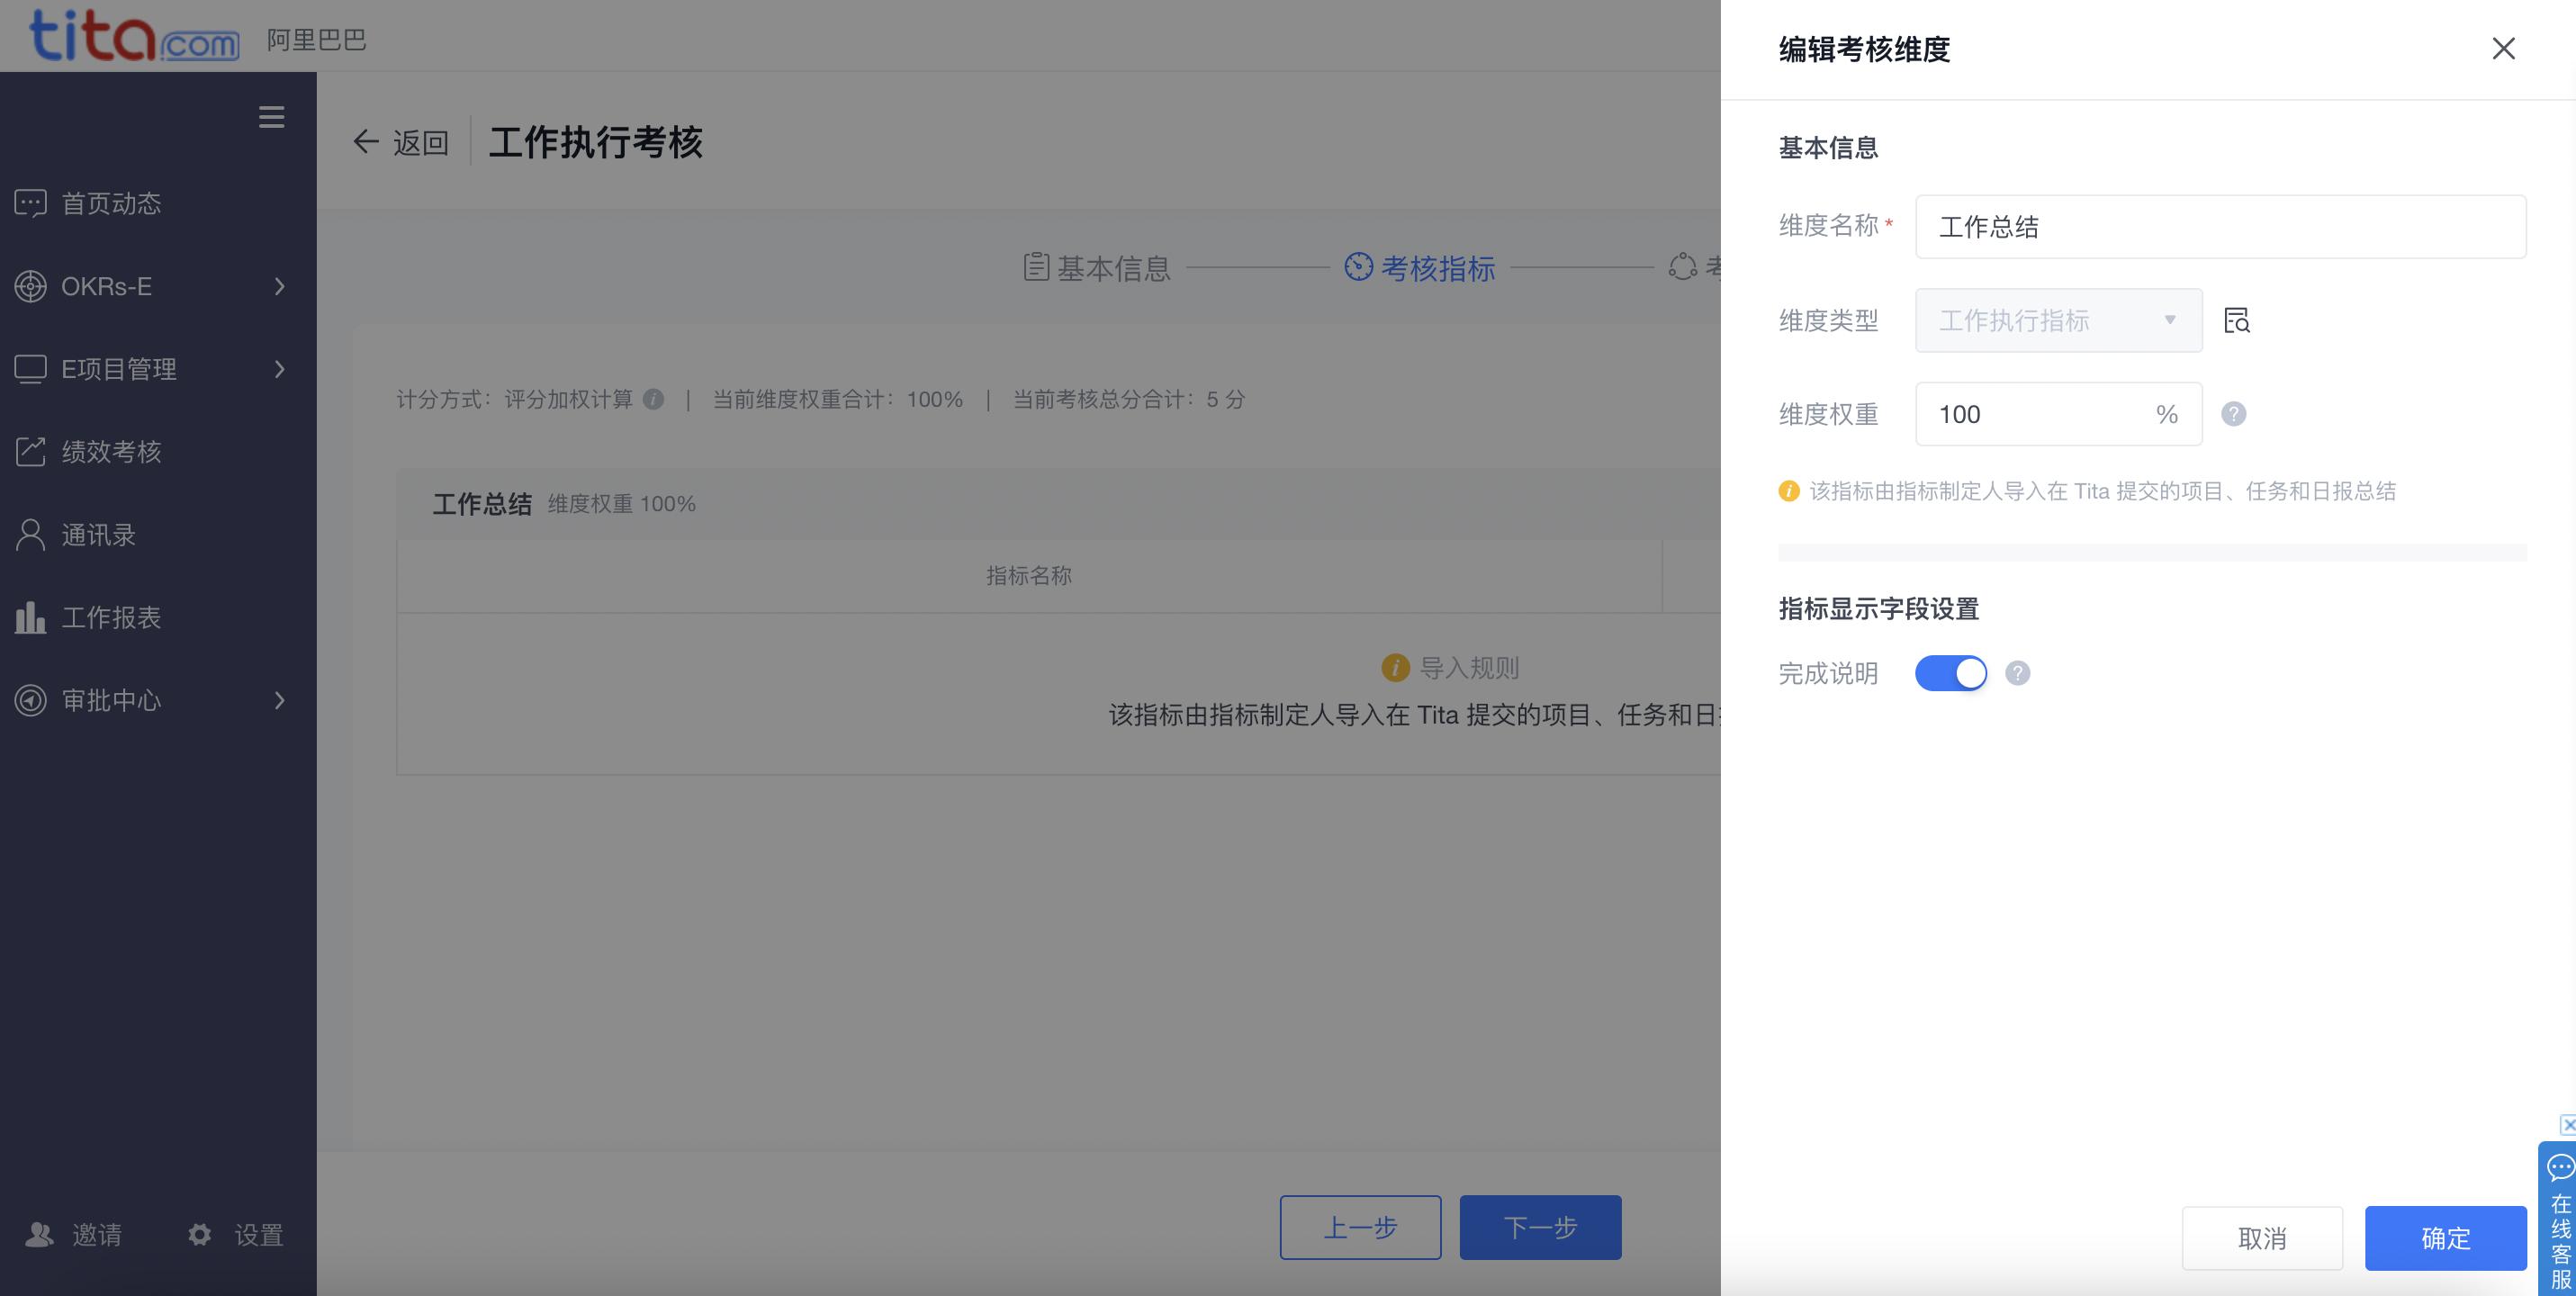 tita.com 升级 |日报总结支持一键纳入考核